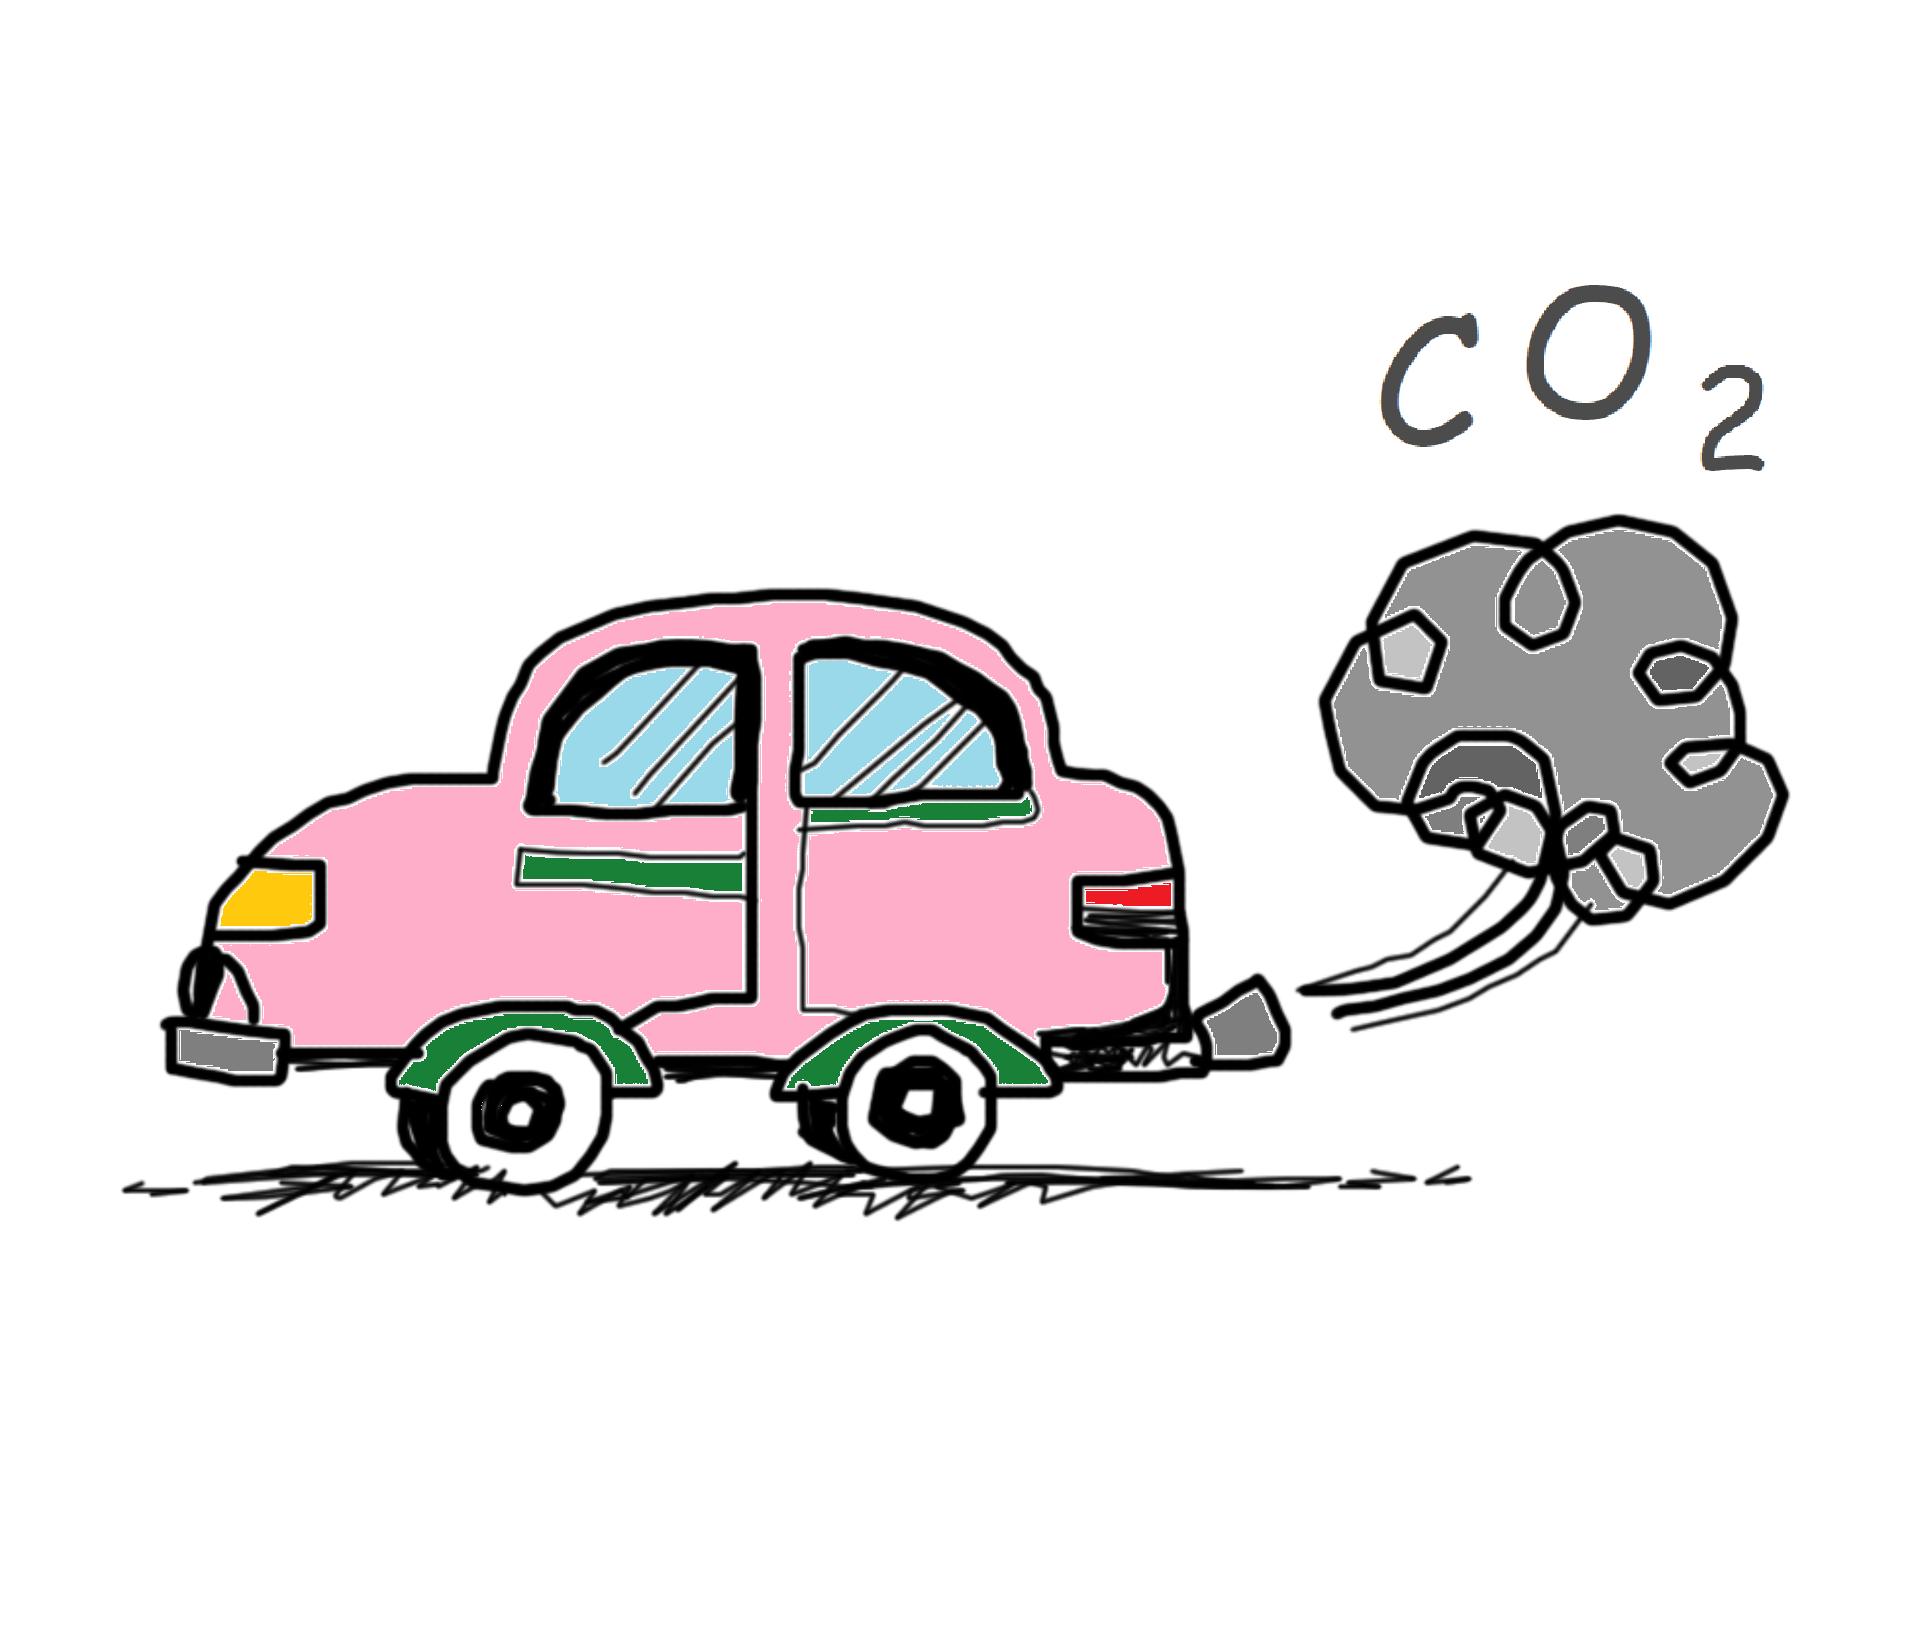 Auto mit Abgaswolke